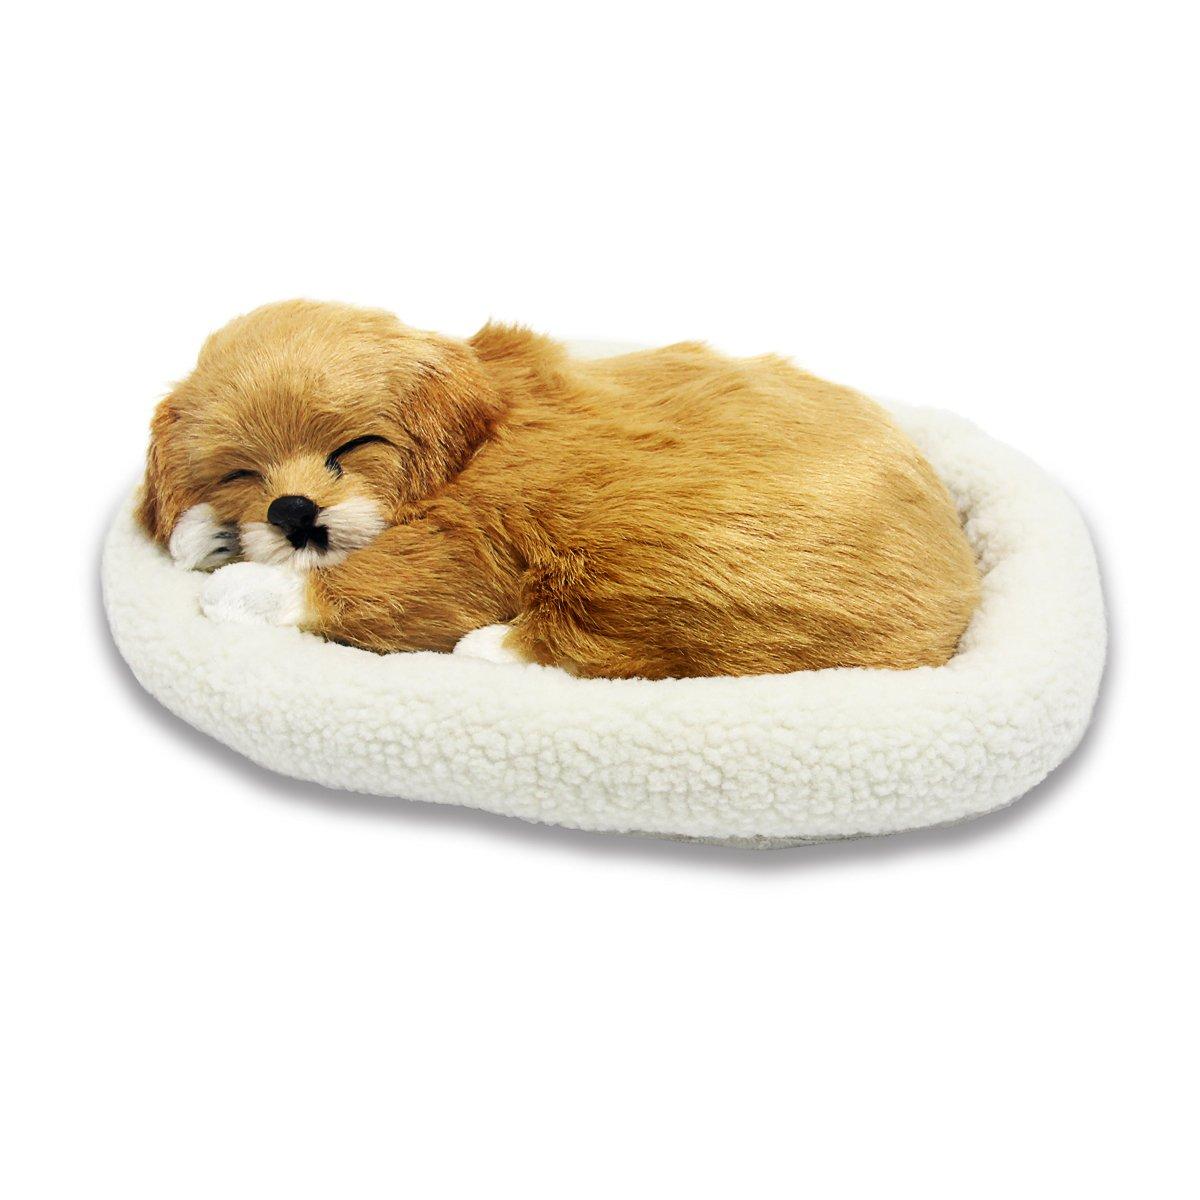 da6d17d921d1 Amazon.com: Signstek Emulation Sleeping Breathing Dog Toy Pet with Woolen  Bed: Toys & Games